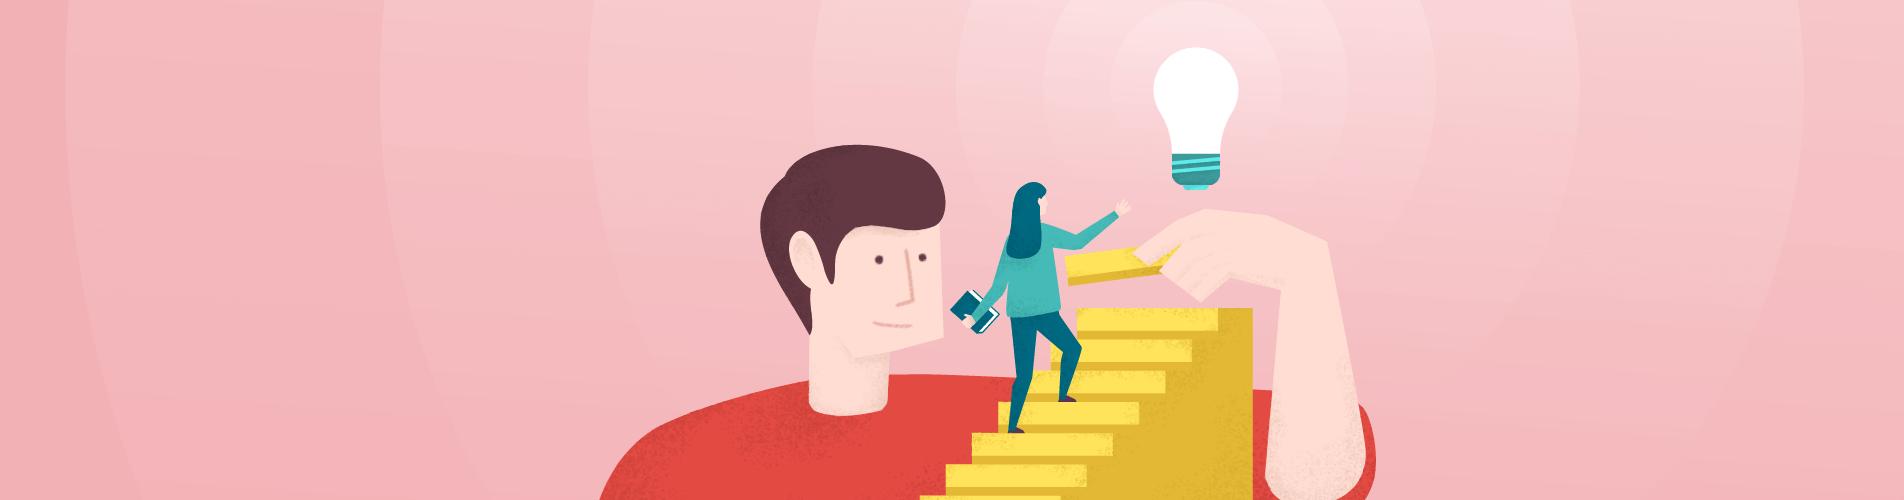 Motivational strategies in online teaching platforms image